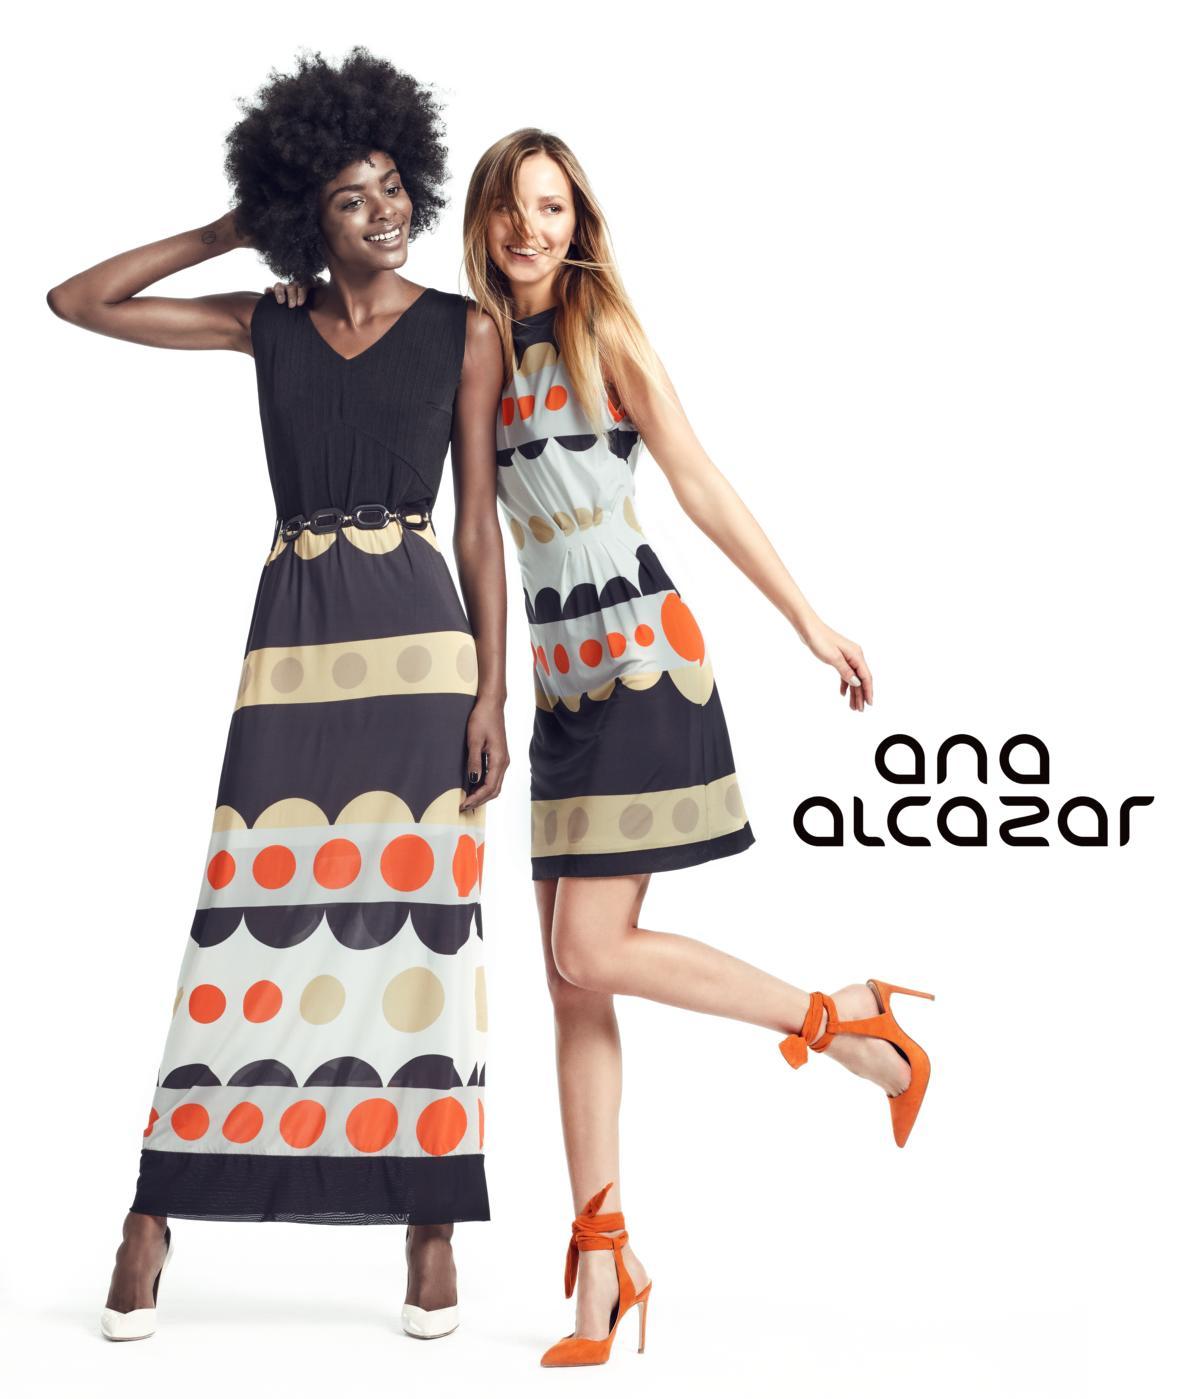 160627_Ana_Alcazar_SS17_LB_Set_White_637